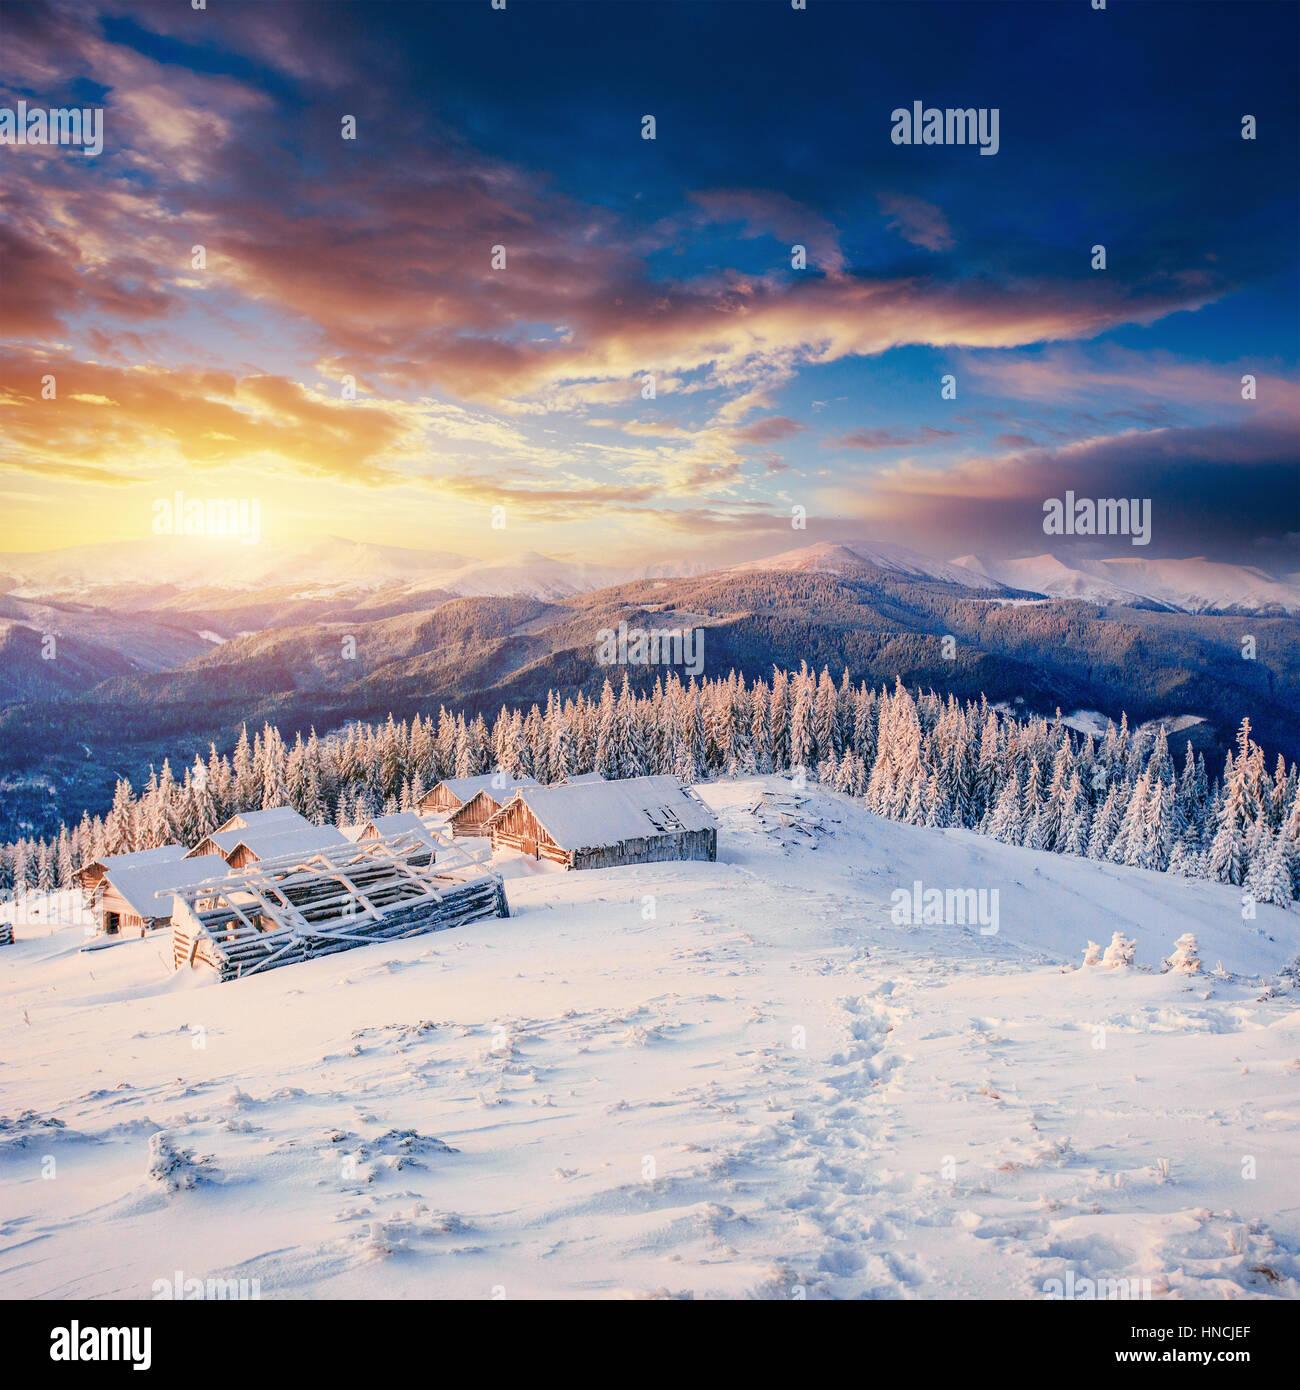 Hütte in den Bergen im Winter. Karpaten, Ukraine-Europa Stockbild